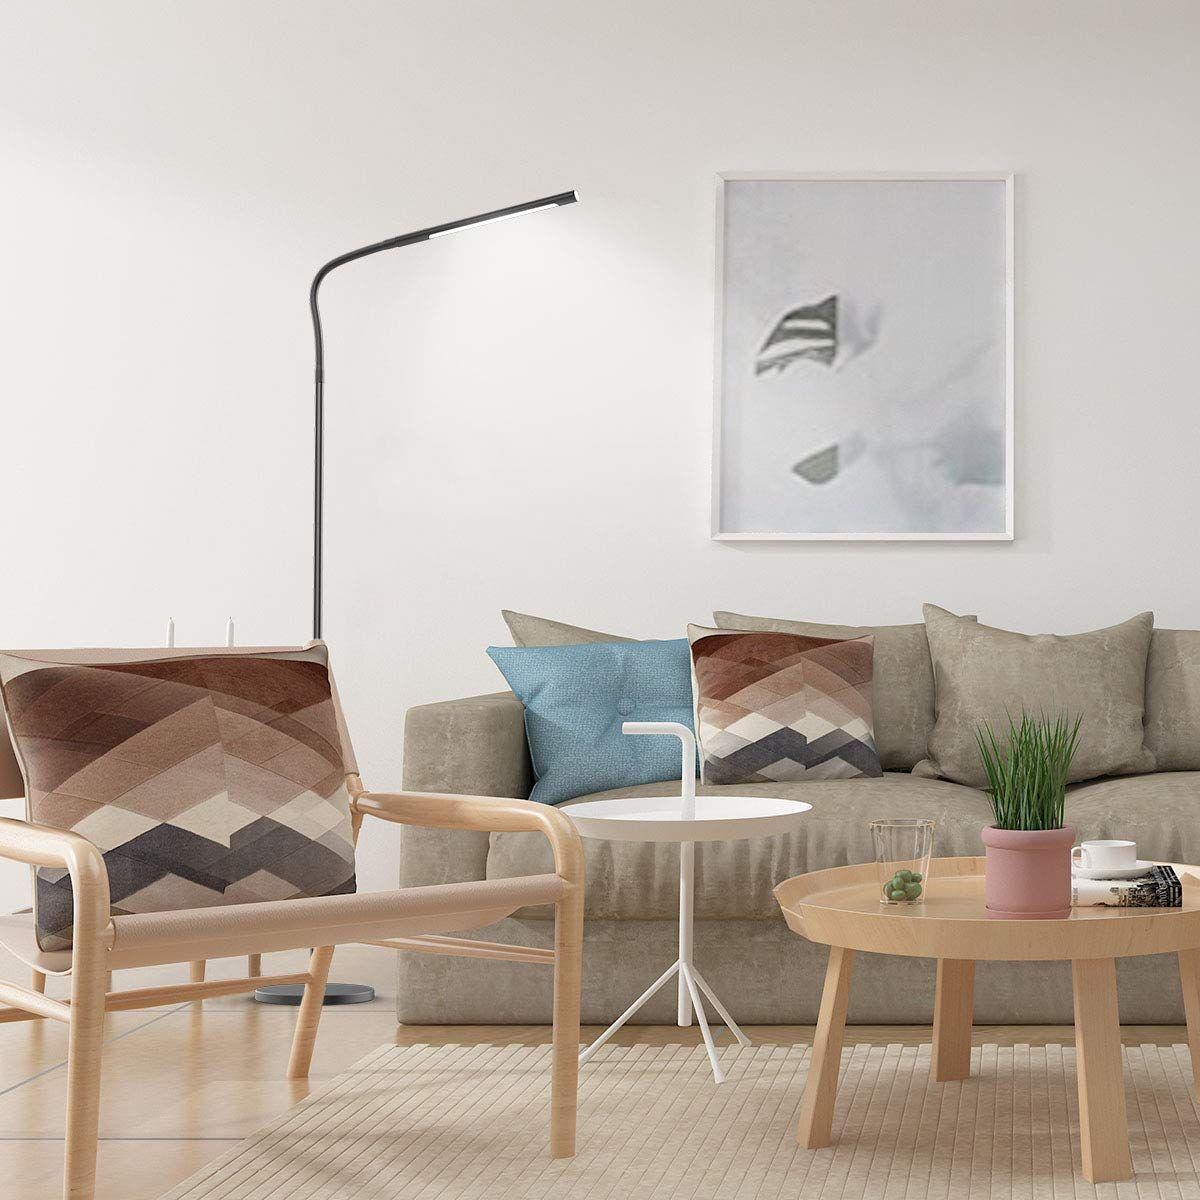 Joly Joy Floor Lamps For Living Room 12w Dimmable Flexible Gooseneck Standing Lamp Reading Light